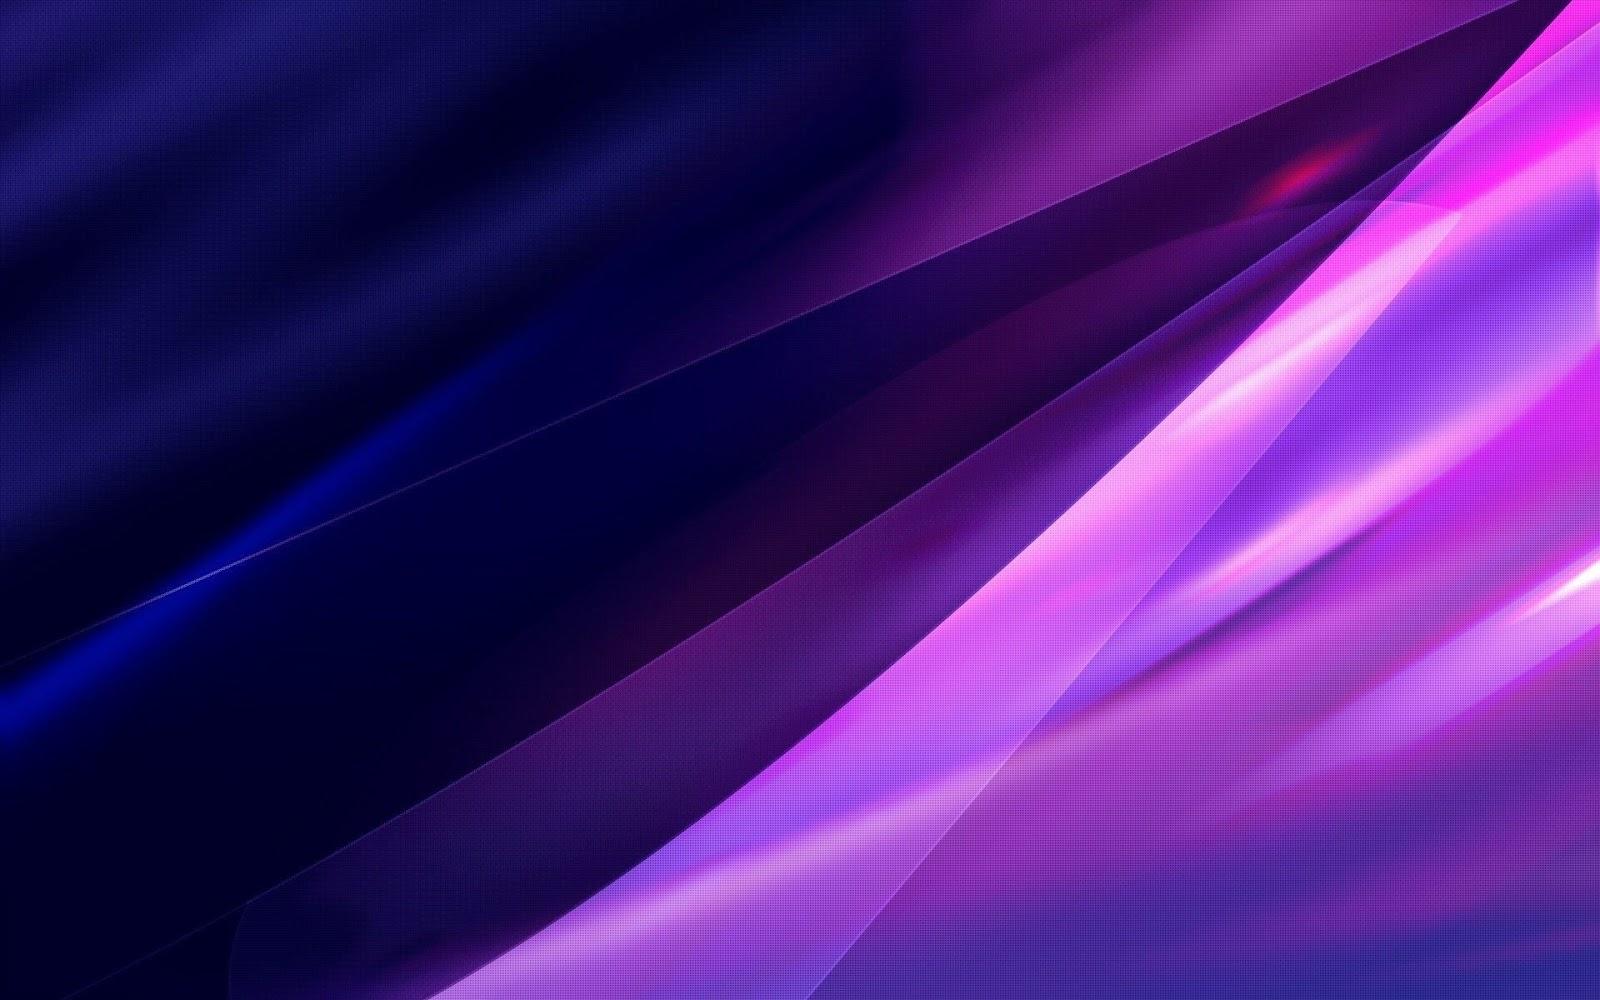 Arrival to Purple Heaven